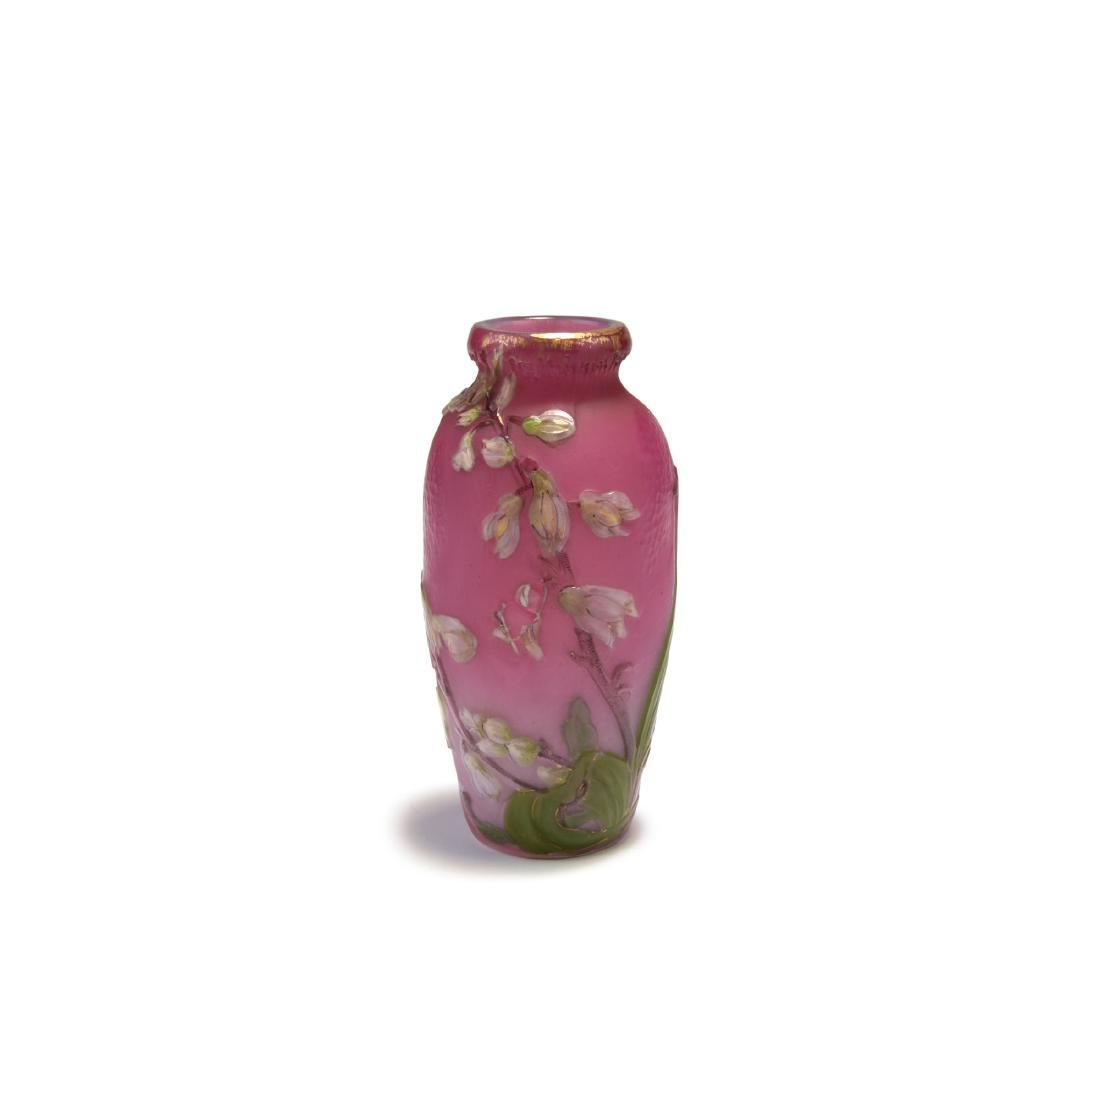 'Orchidees' vase, 1895-1903